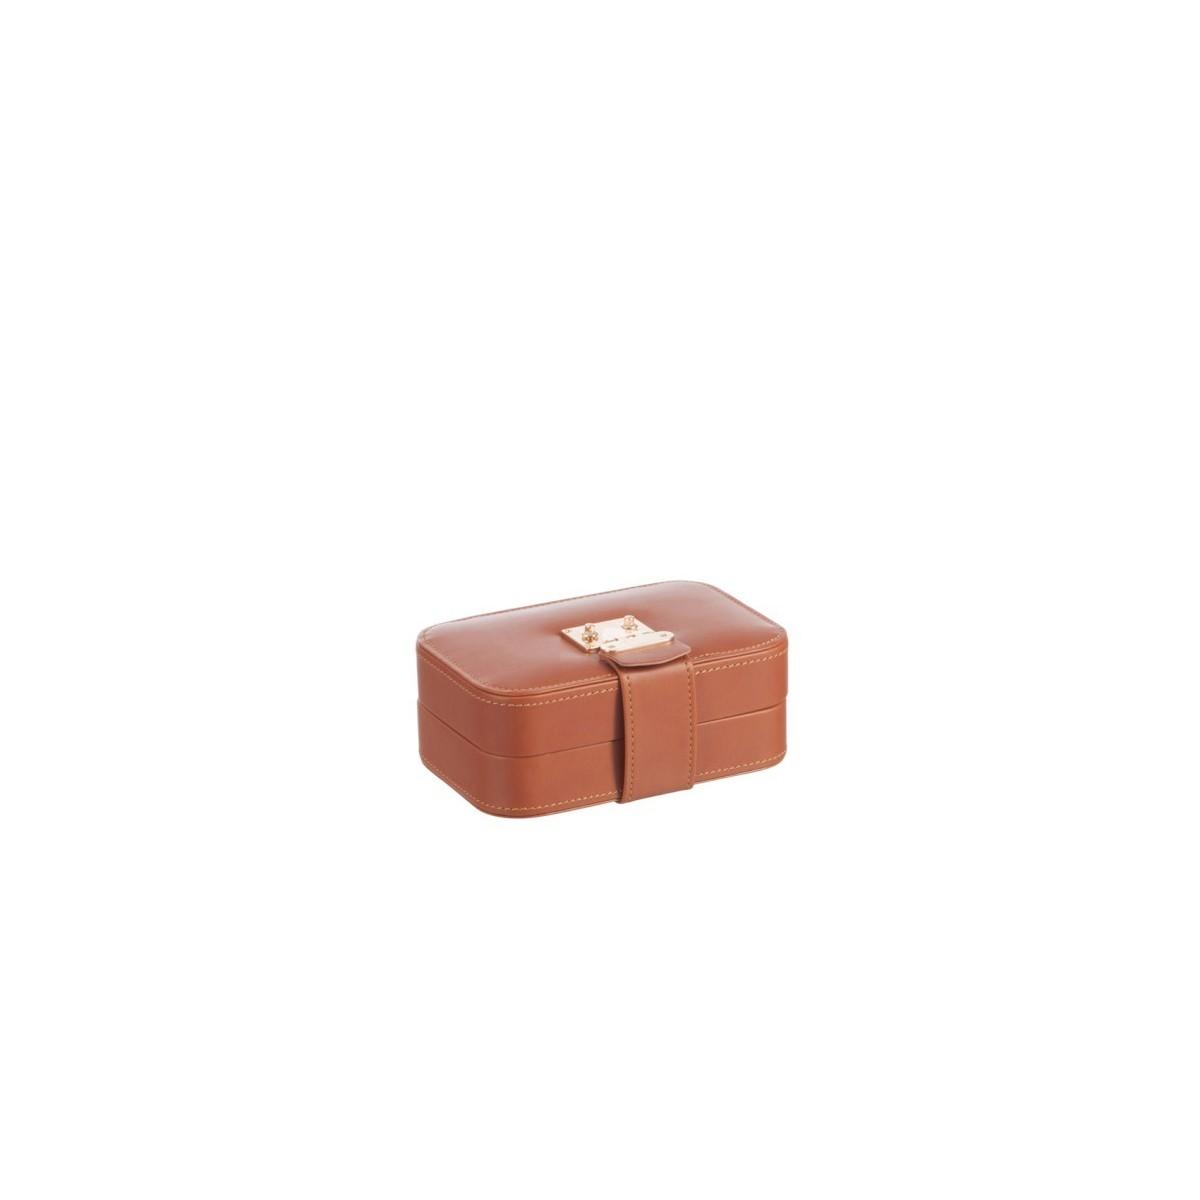 boite à bijoux Caramel